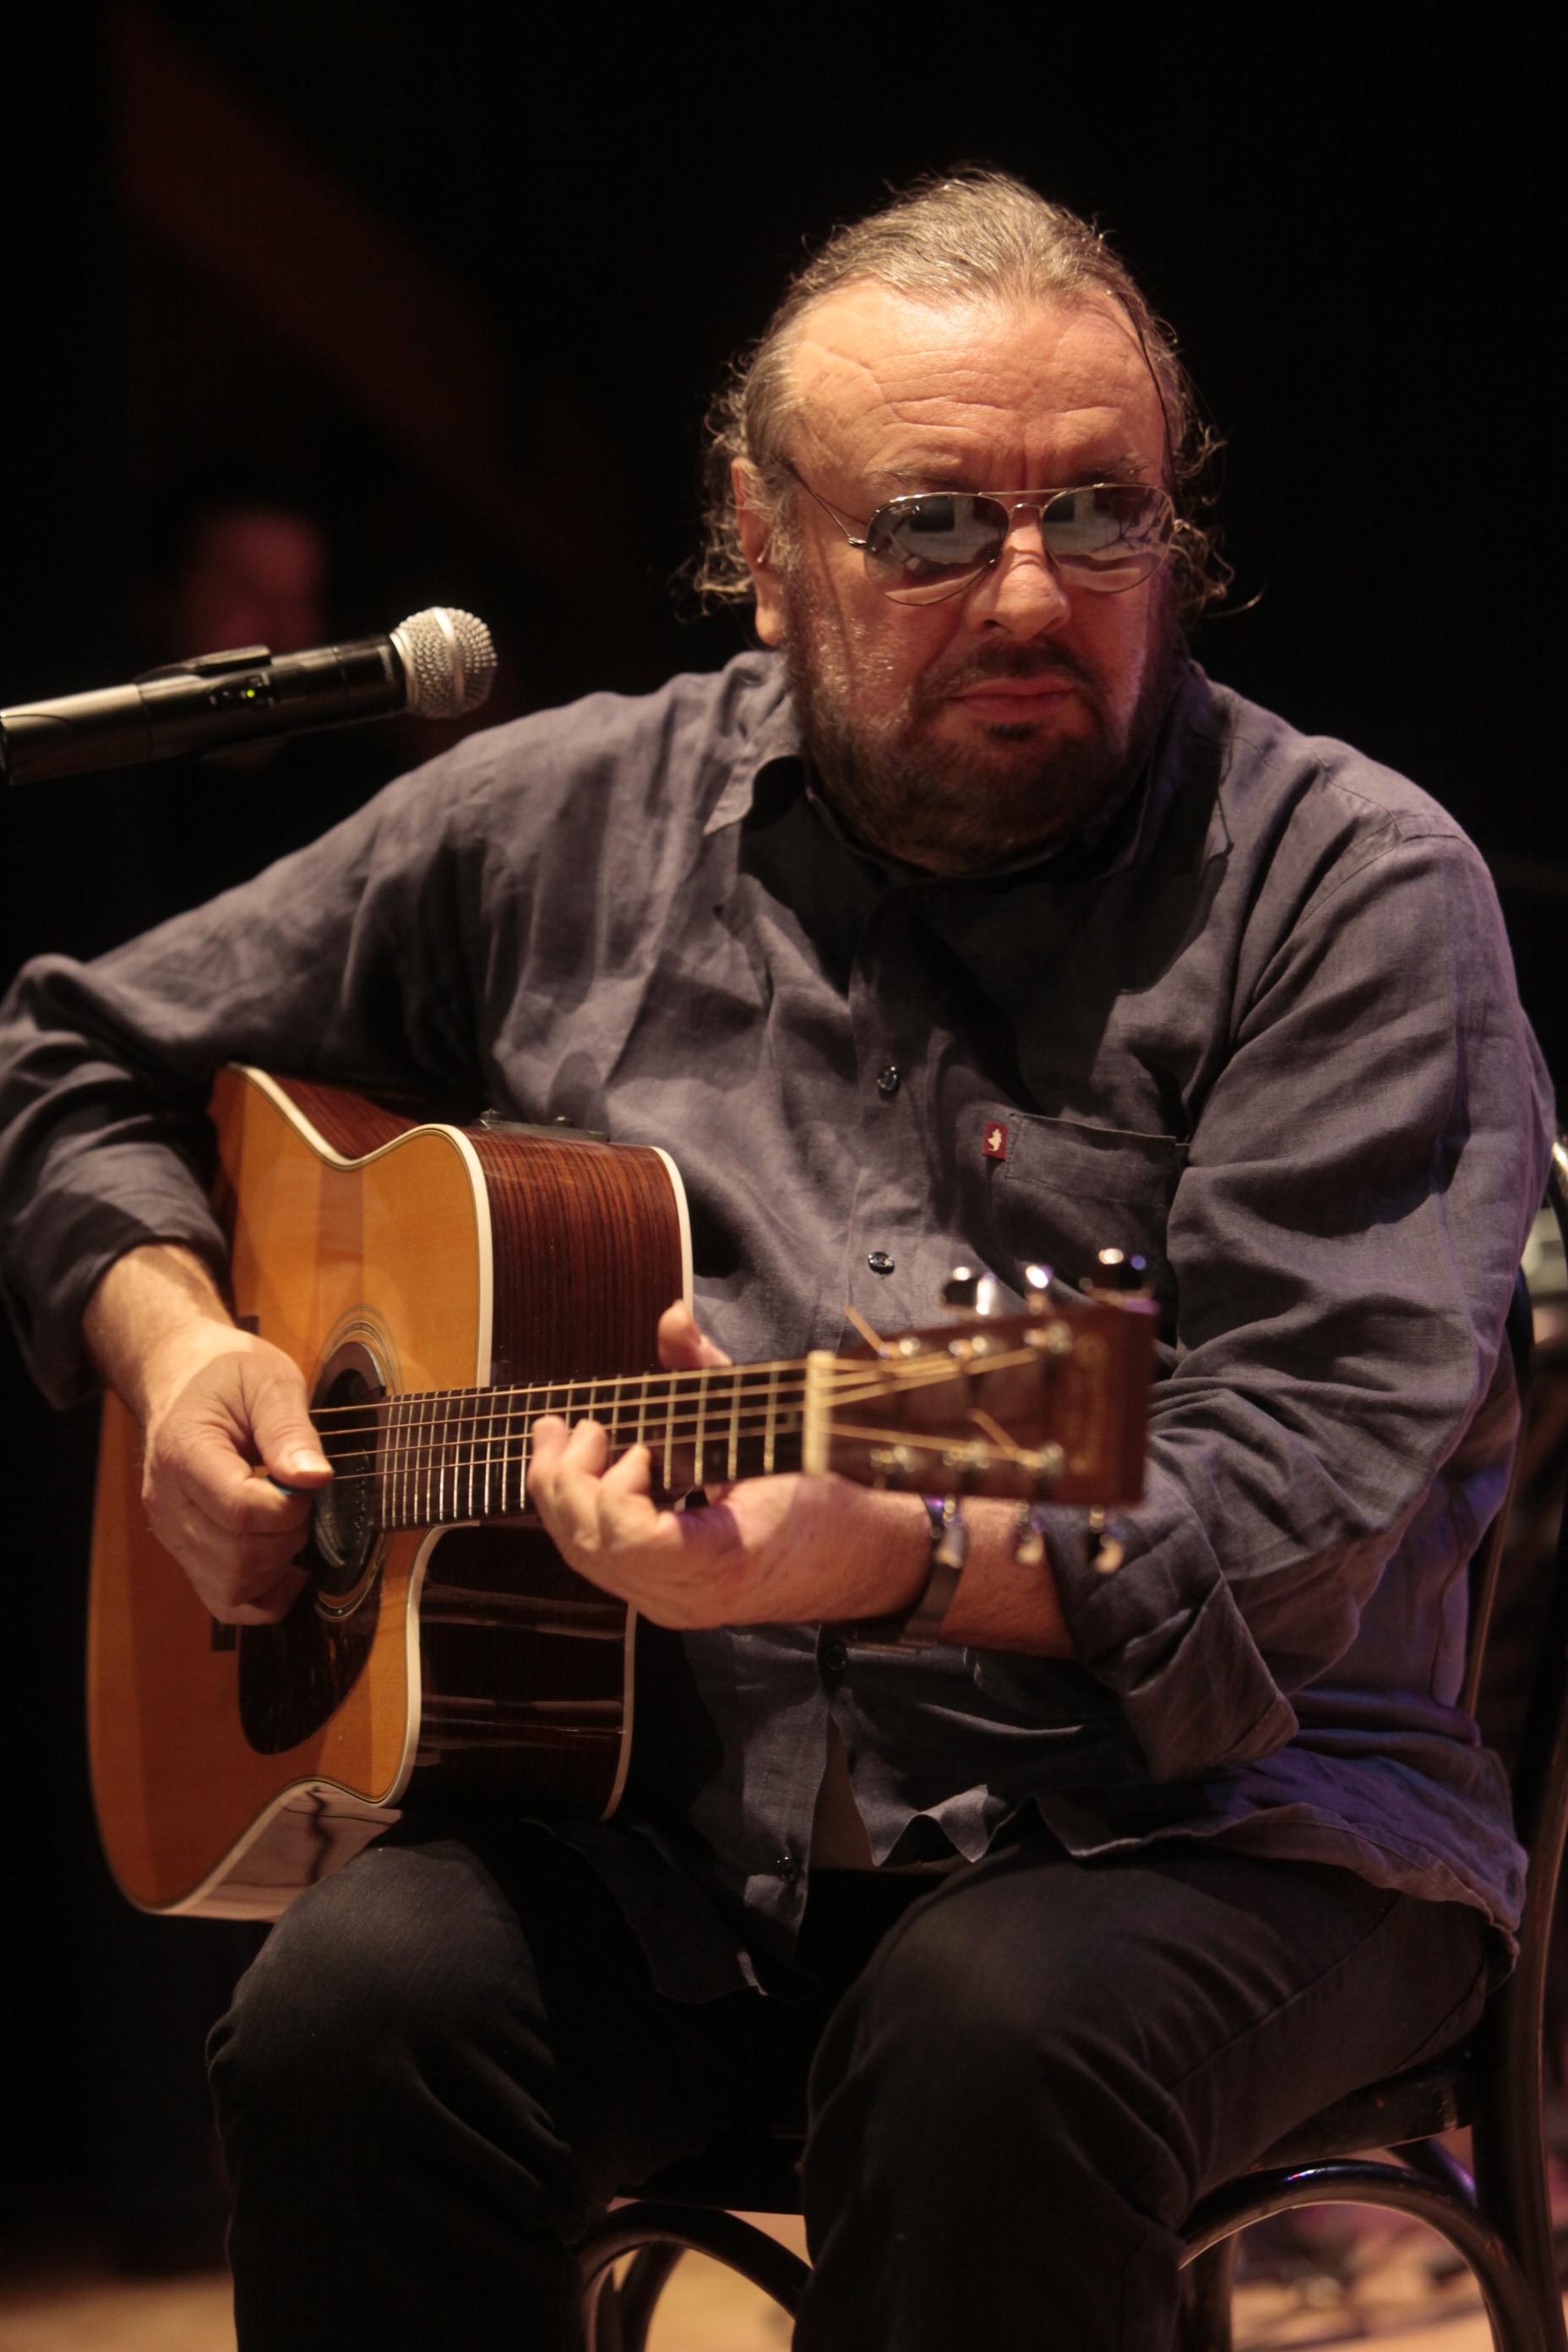 Roberto Ciotti